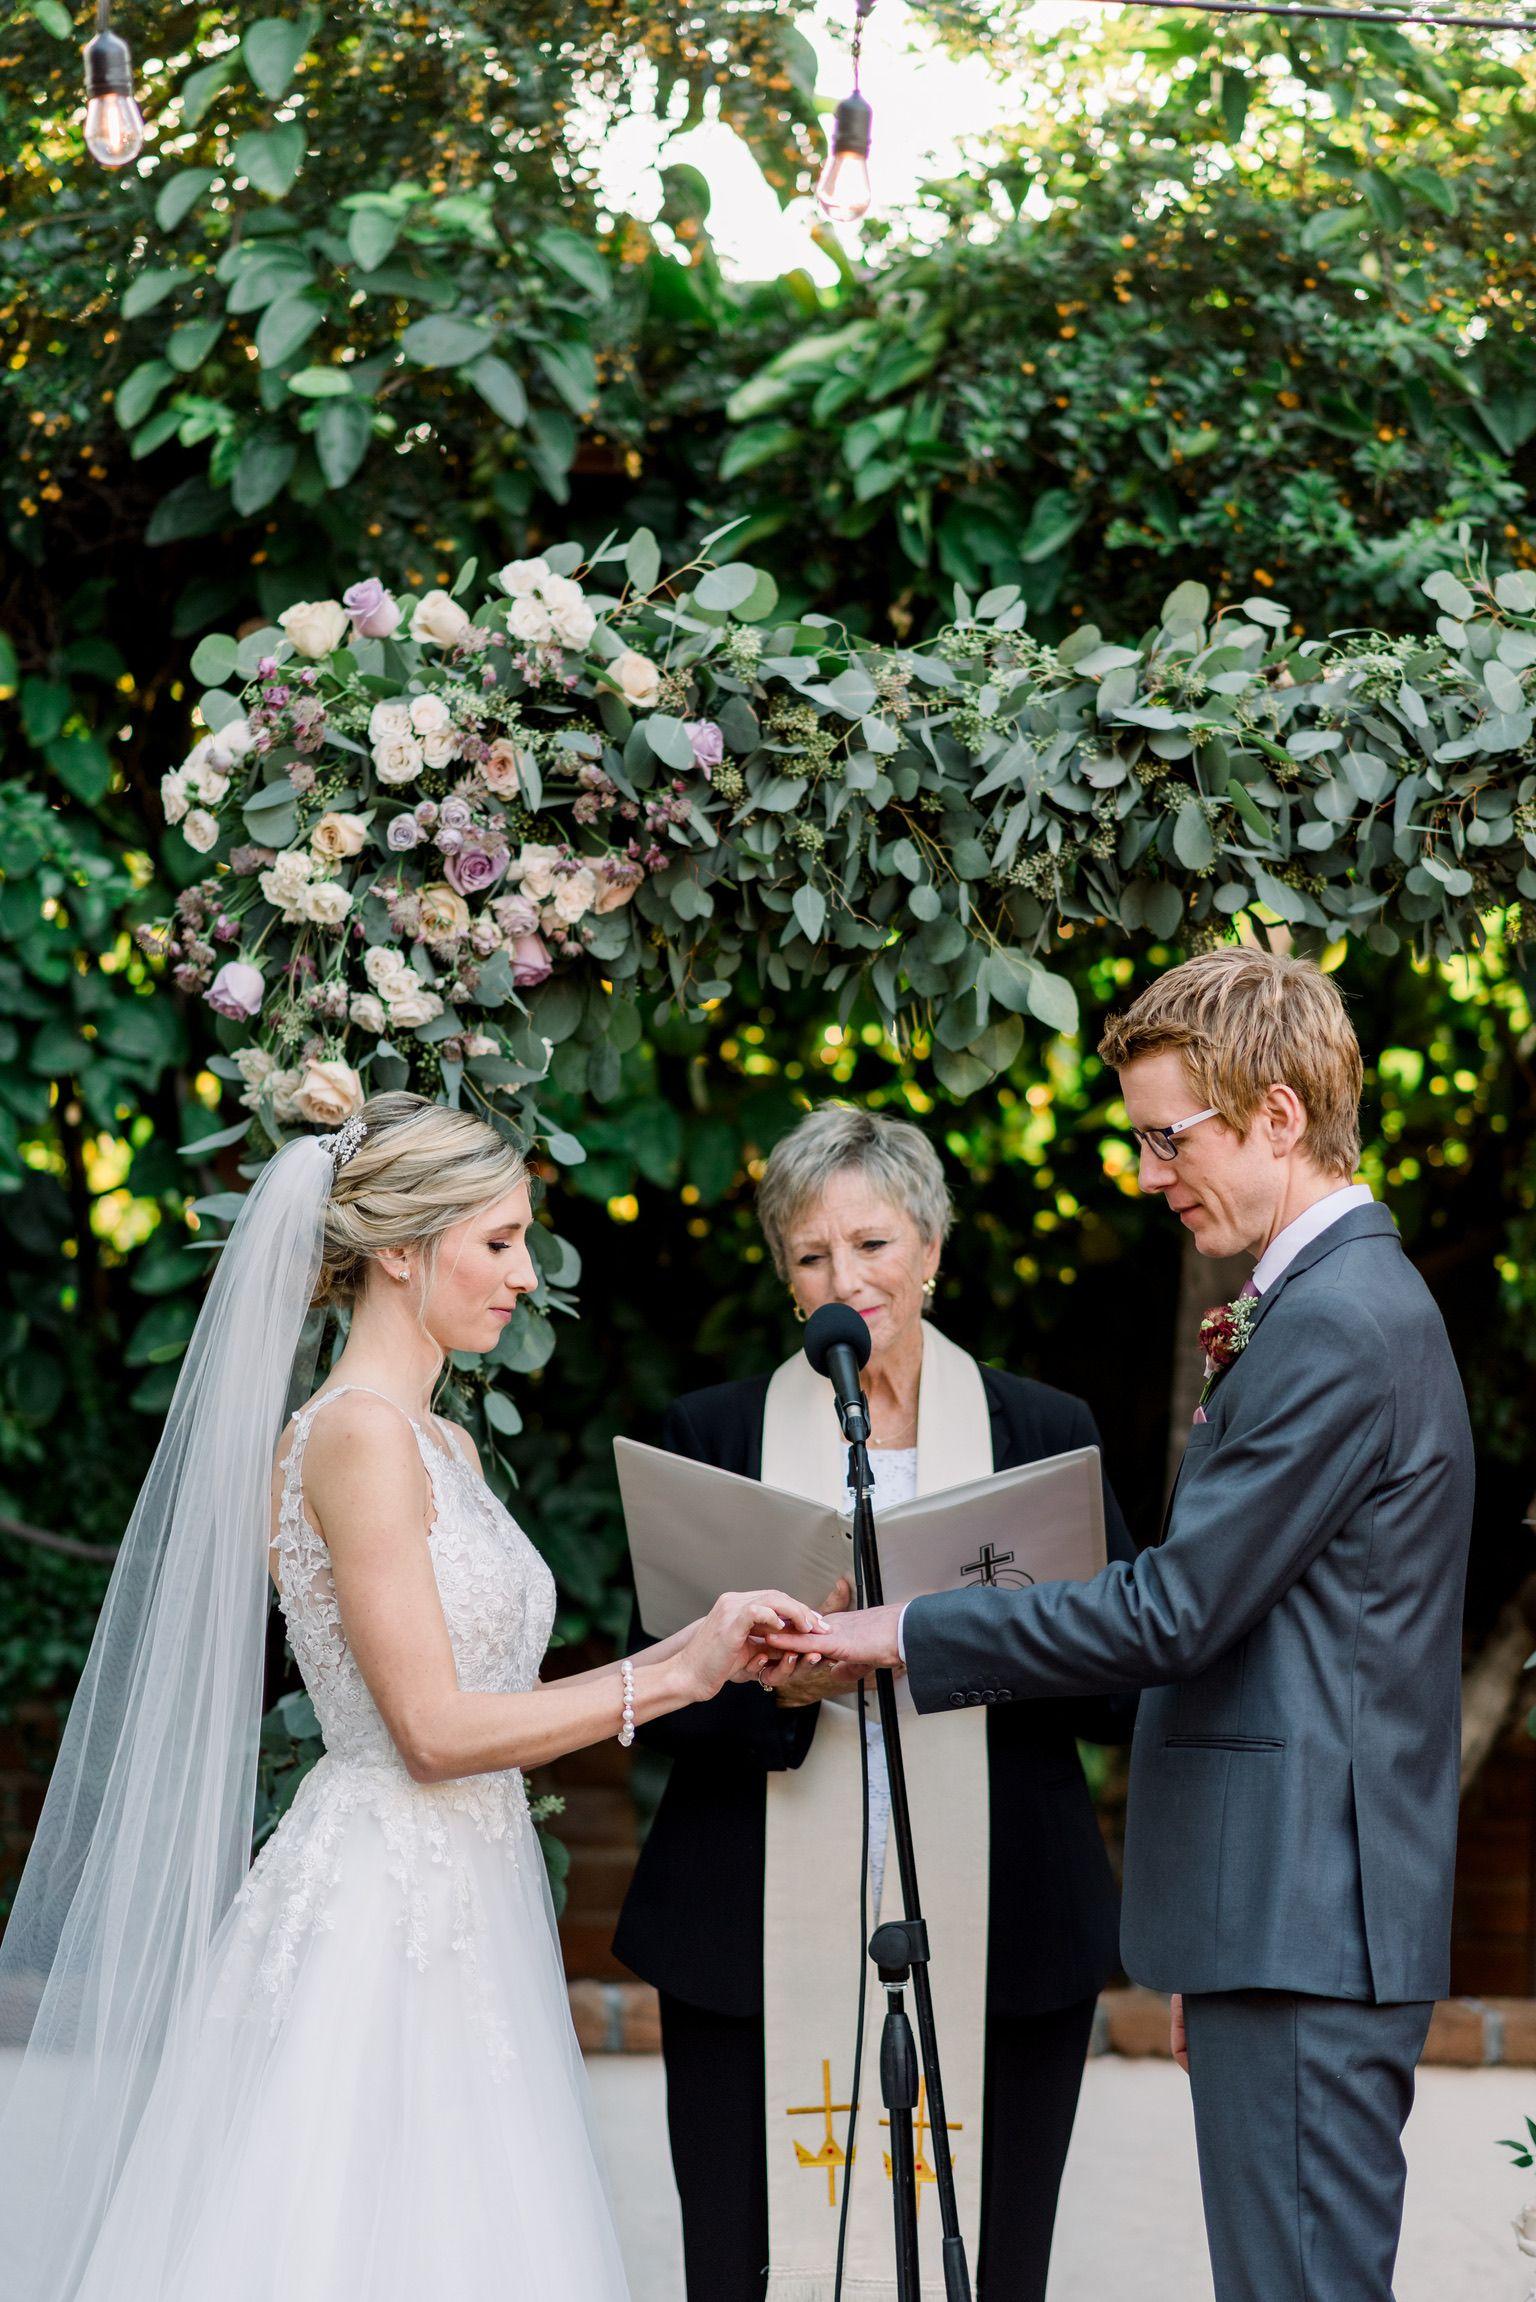 A London Boy And His American Bride In 2020 Oc Wedding Bride Wedding Officiant